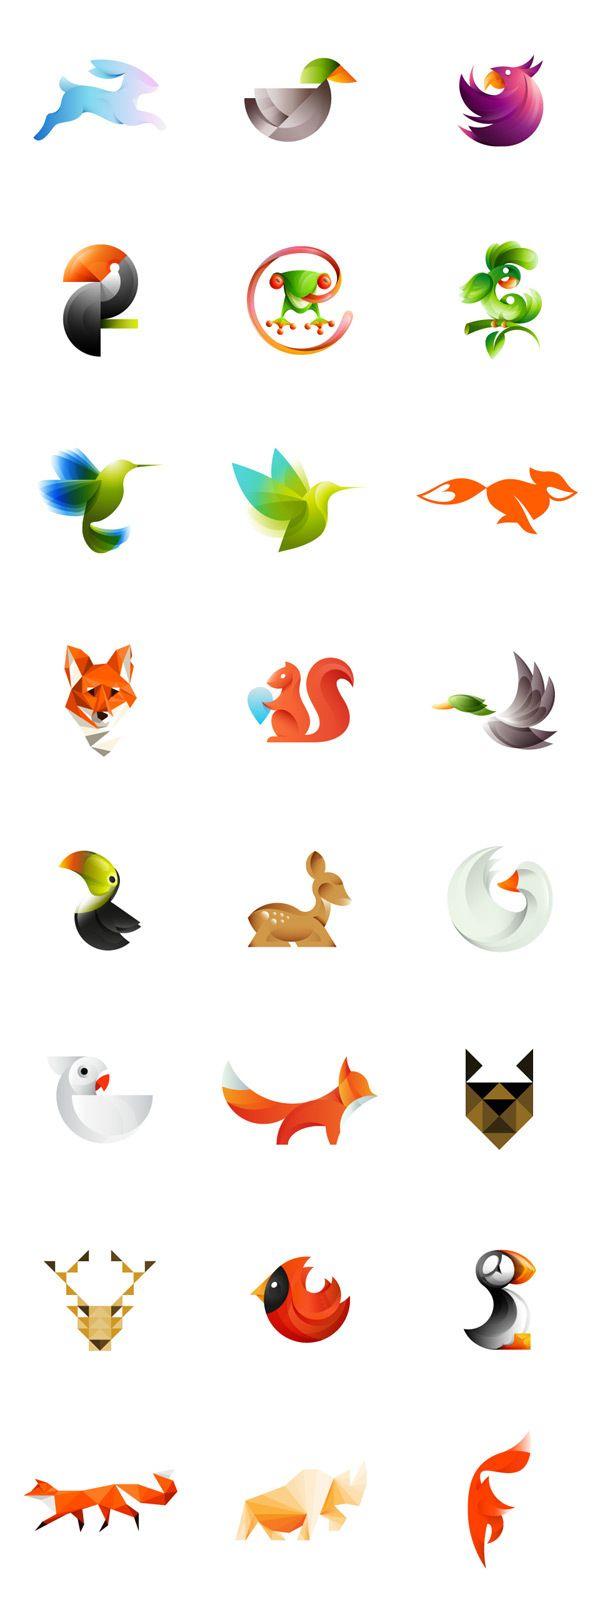 gradient illustration style animal icon